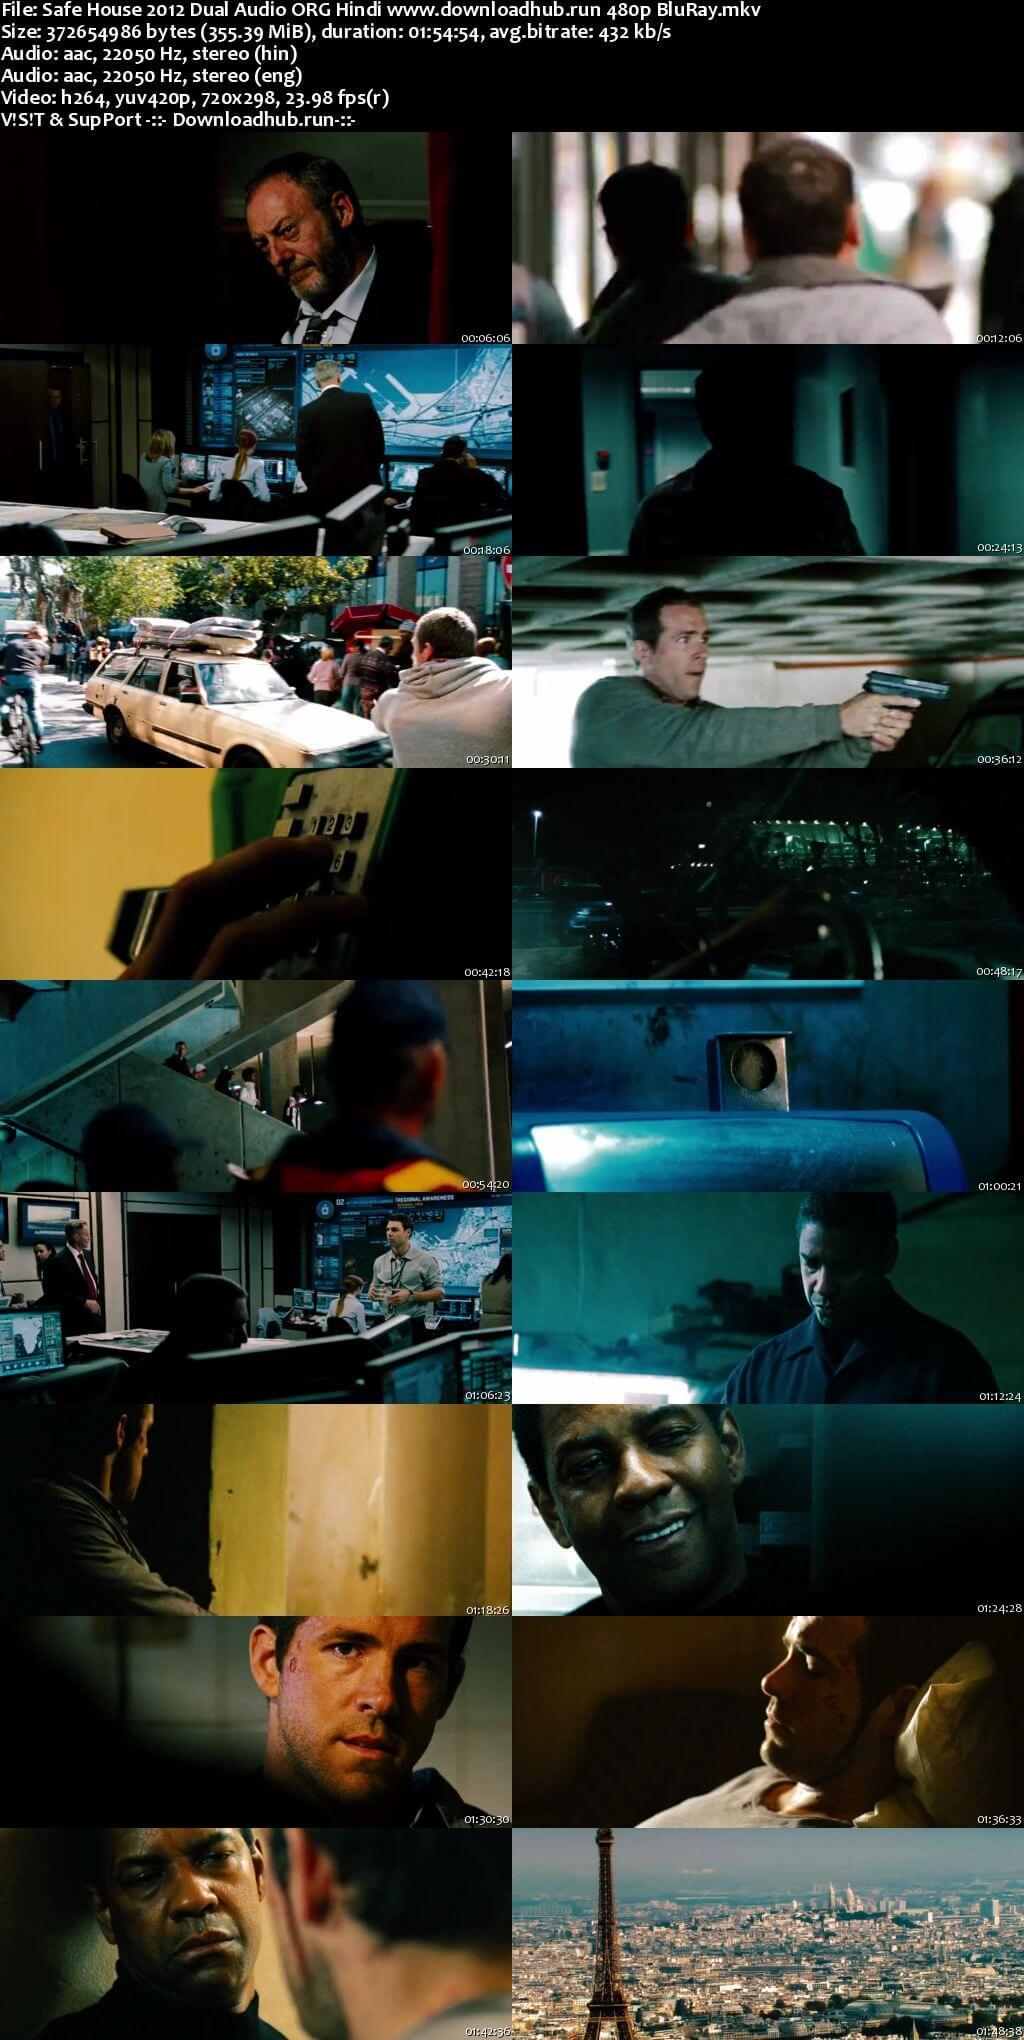 Safe House 2012 Hindi Dual Audio 350MB BluRay 480p